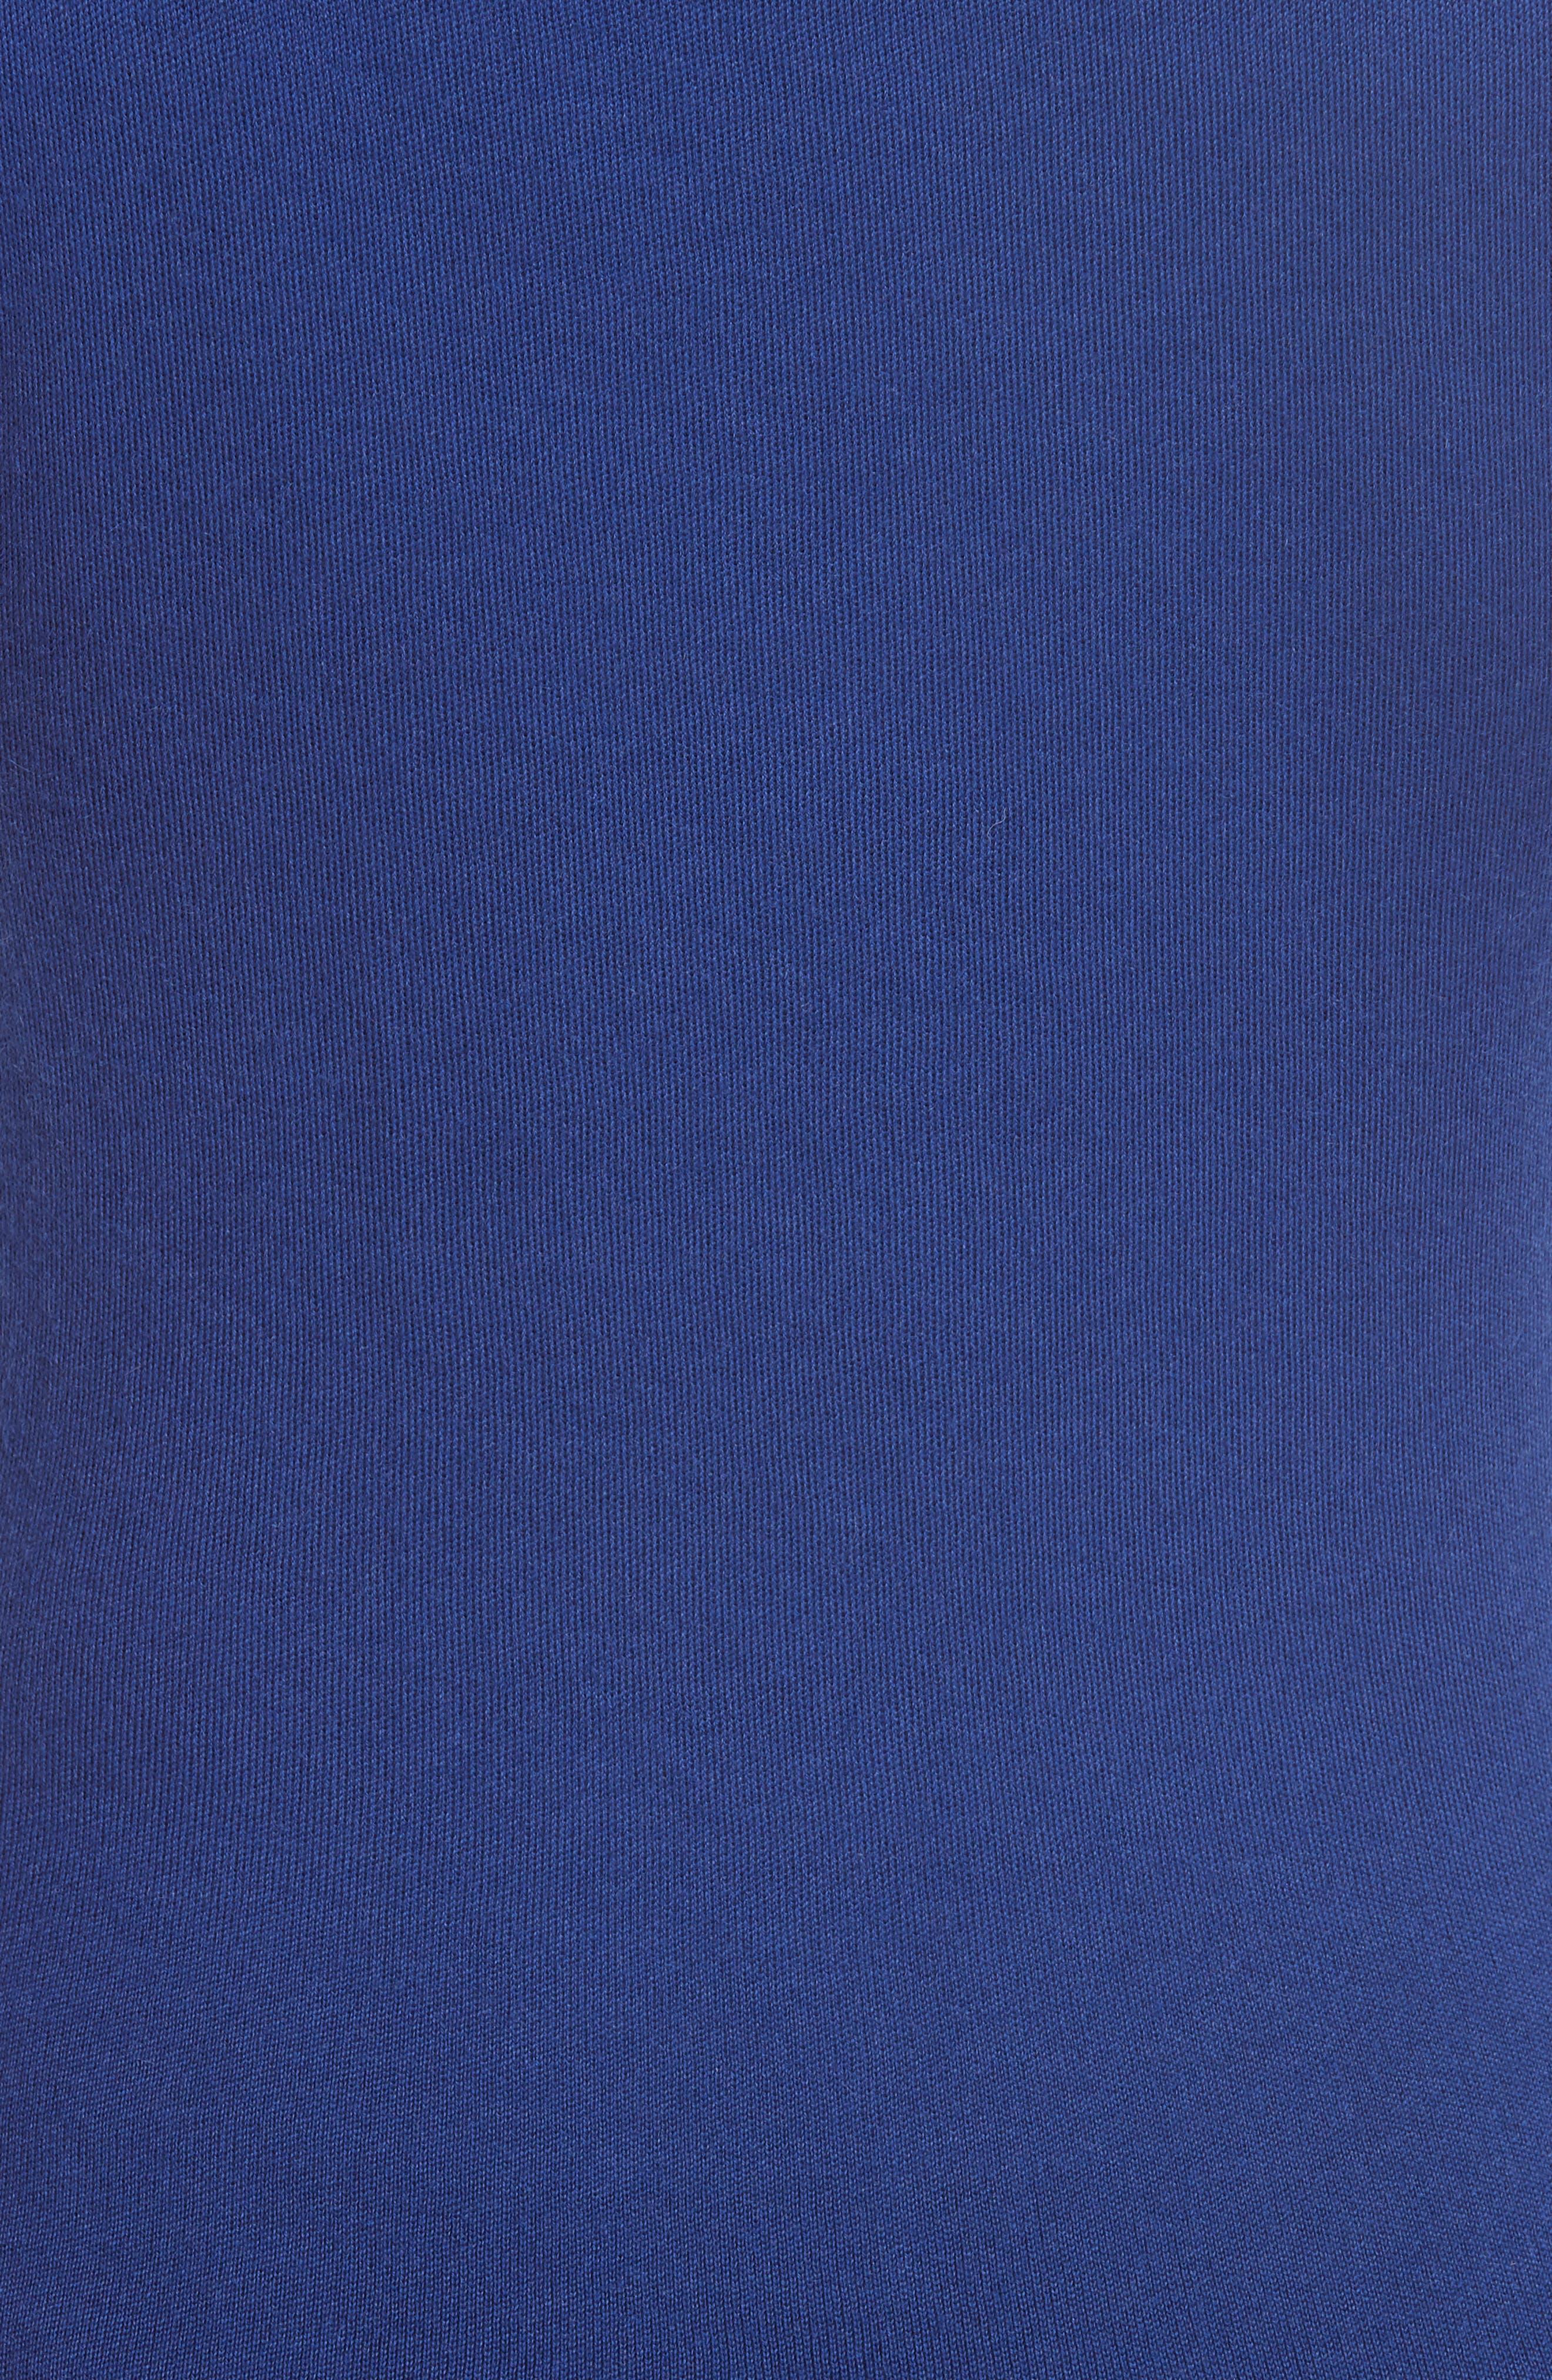 Cashmere Tank Top,                             Alternate thumbnail 5, color,                             LAPIS